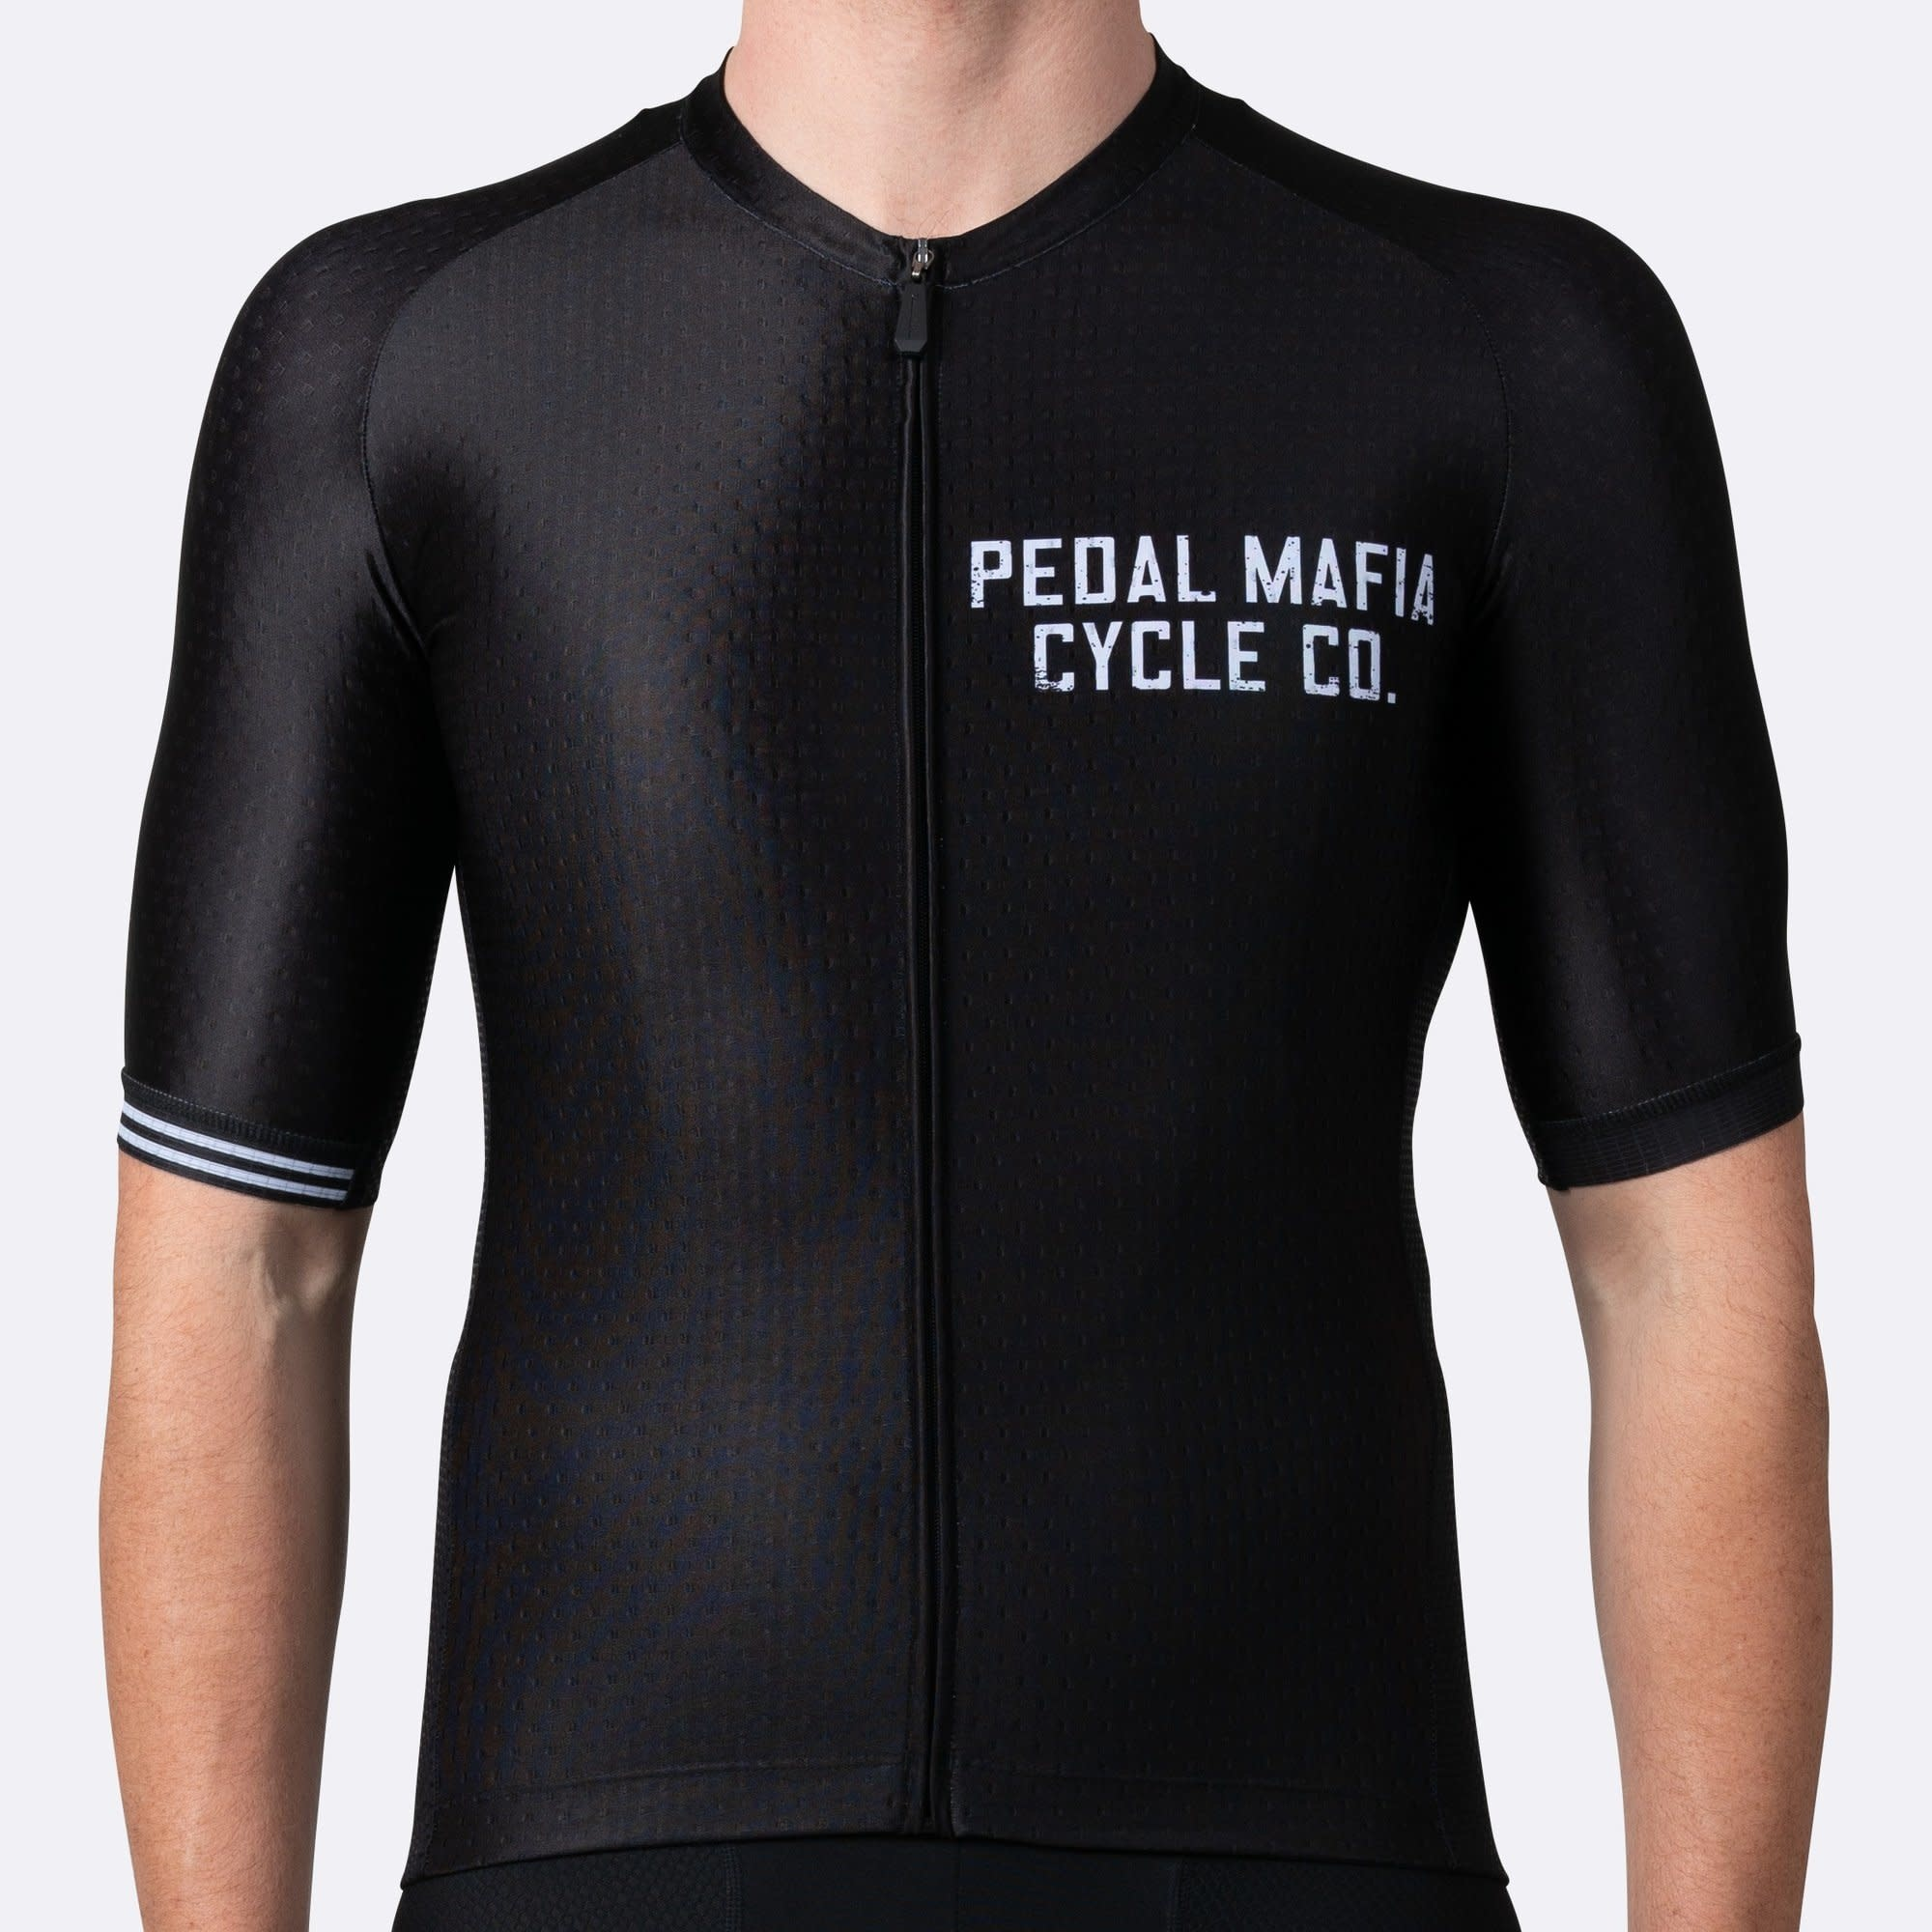 Pedal Mafia PEDAL MAFIA MENS ARTIST SERIES JERSEY - CYCLE CO BLACK